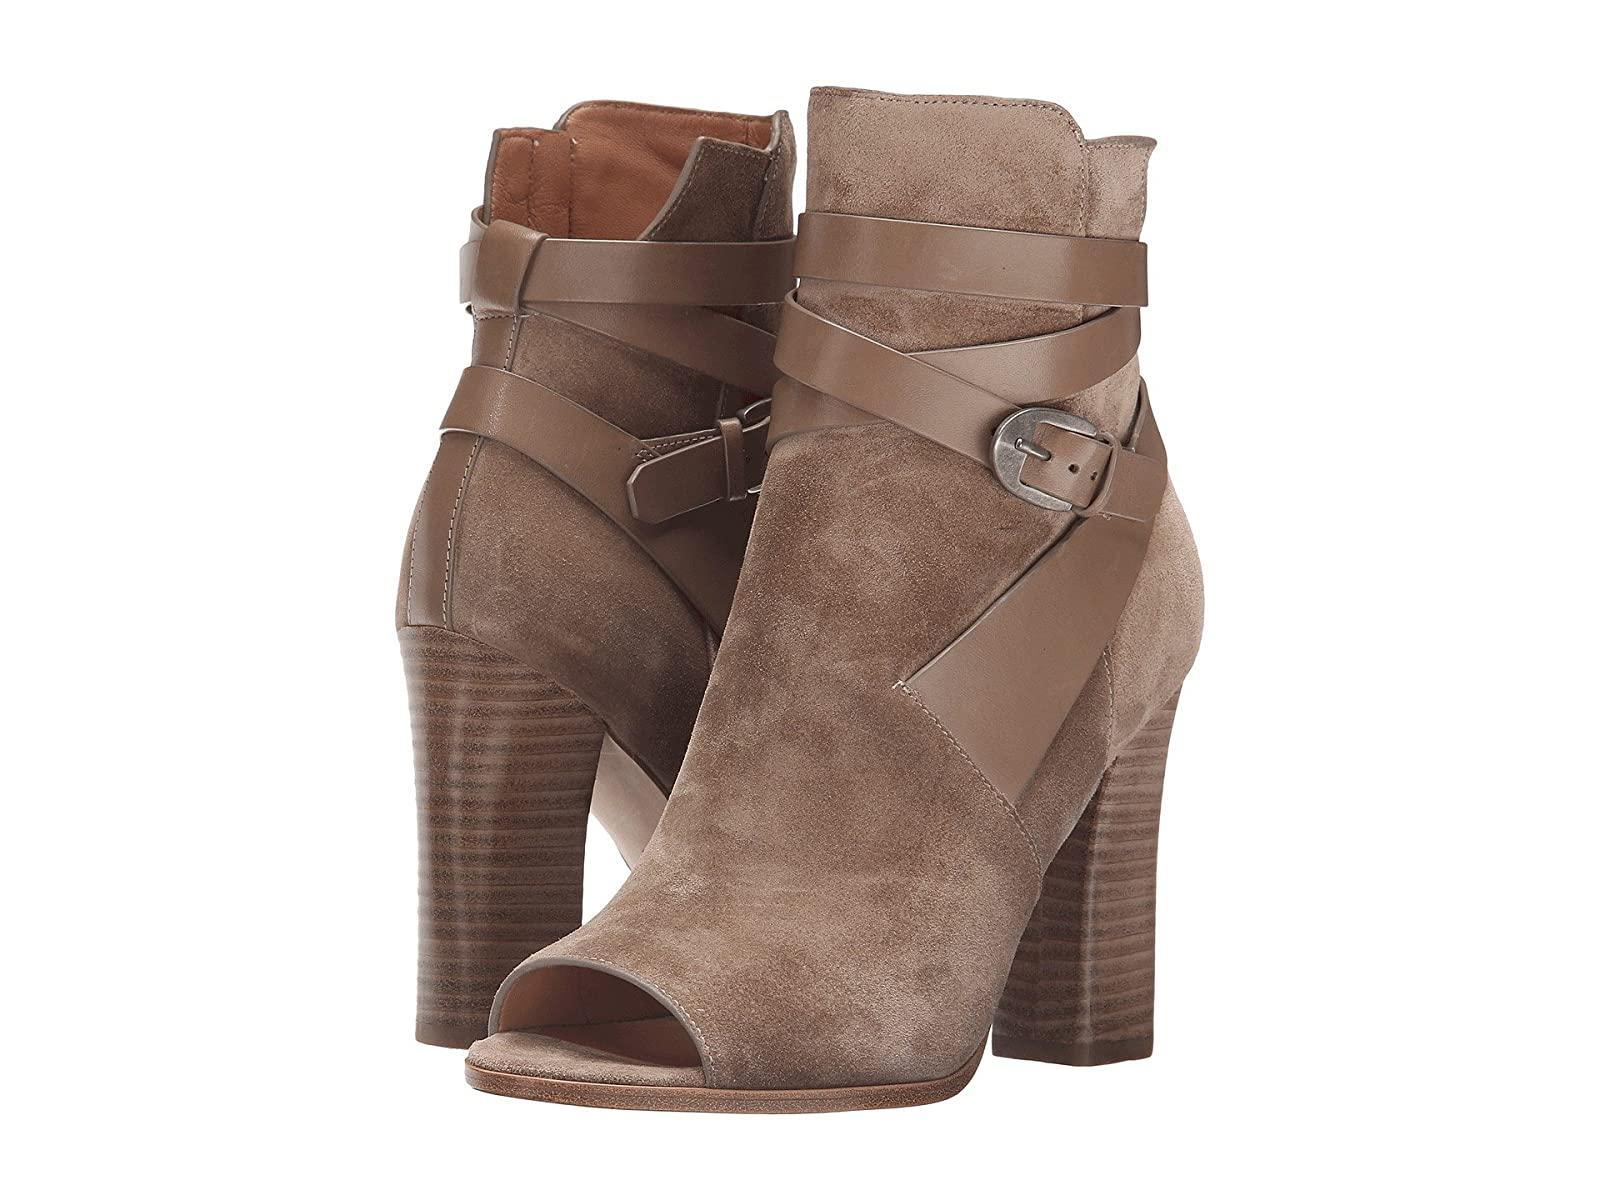 Sigerson Morrison LacieCheap and distinctive eye-catching shoes